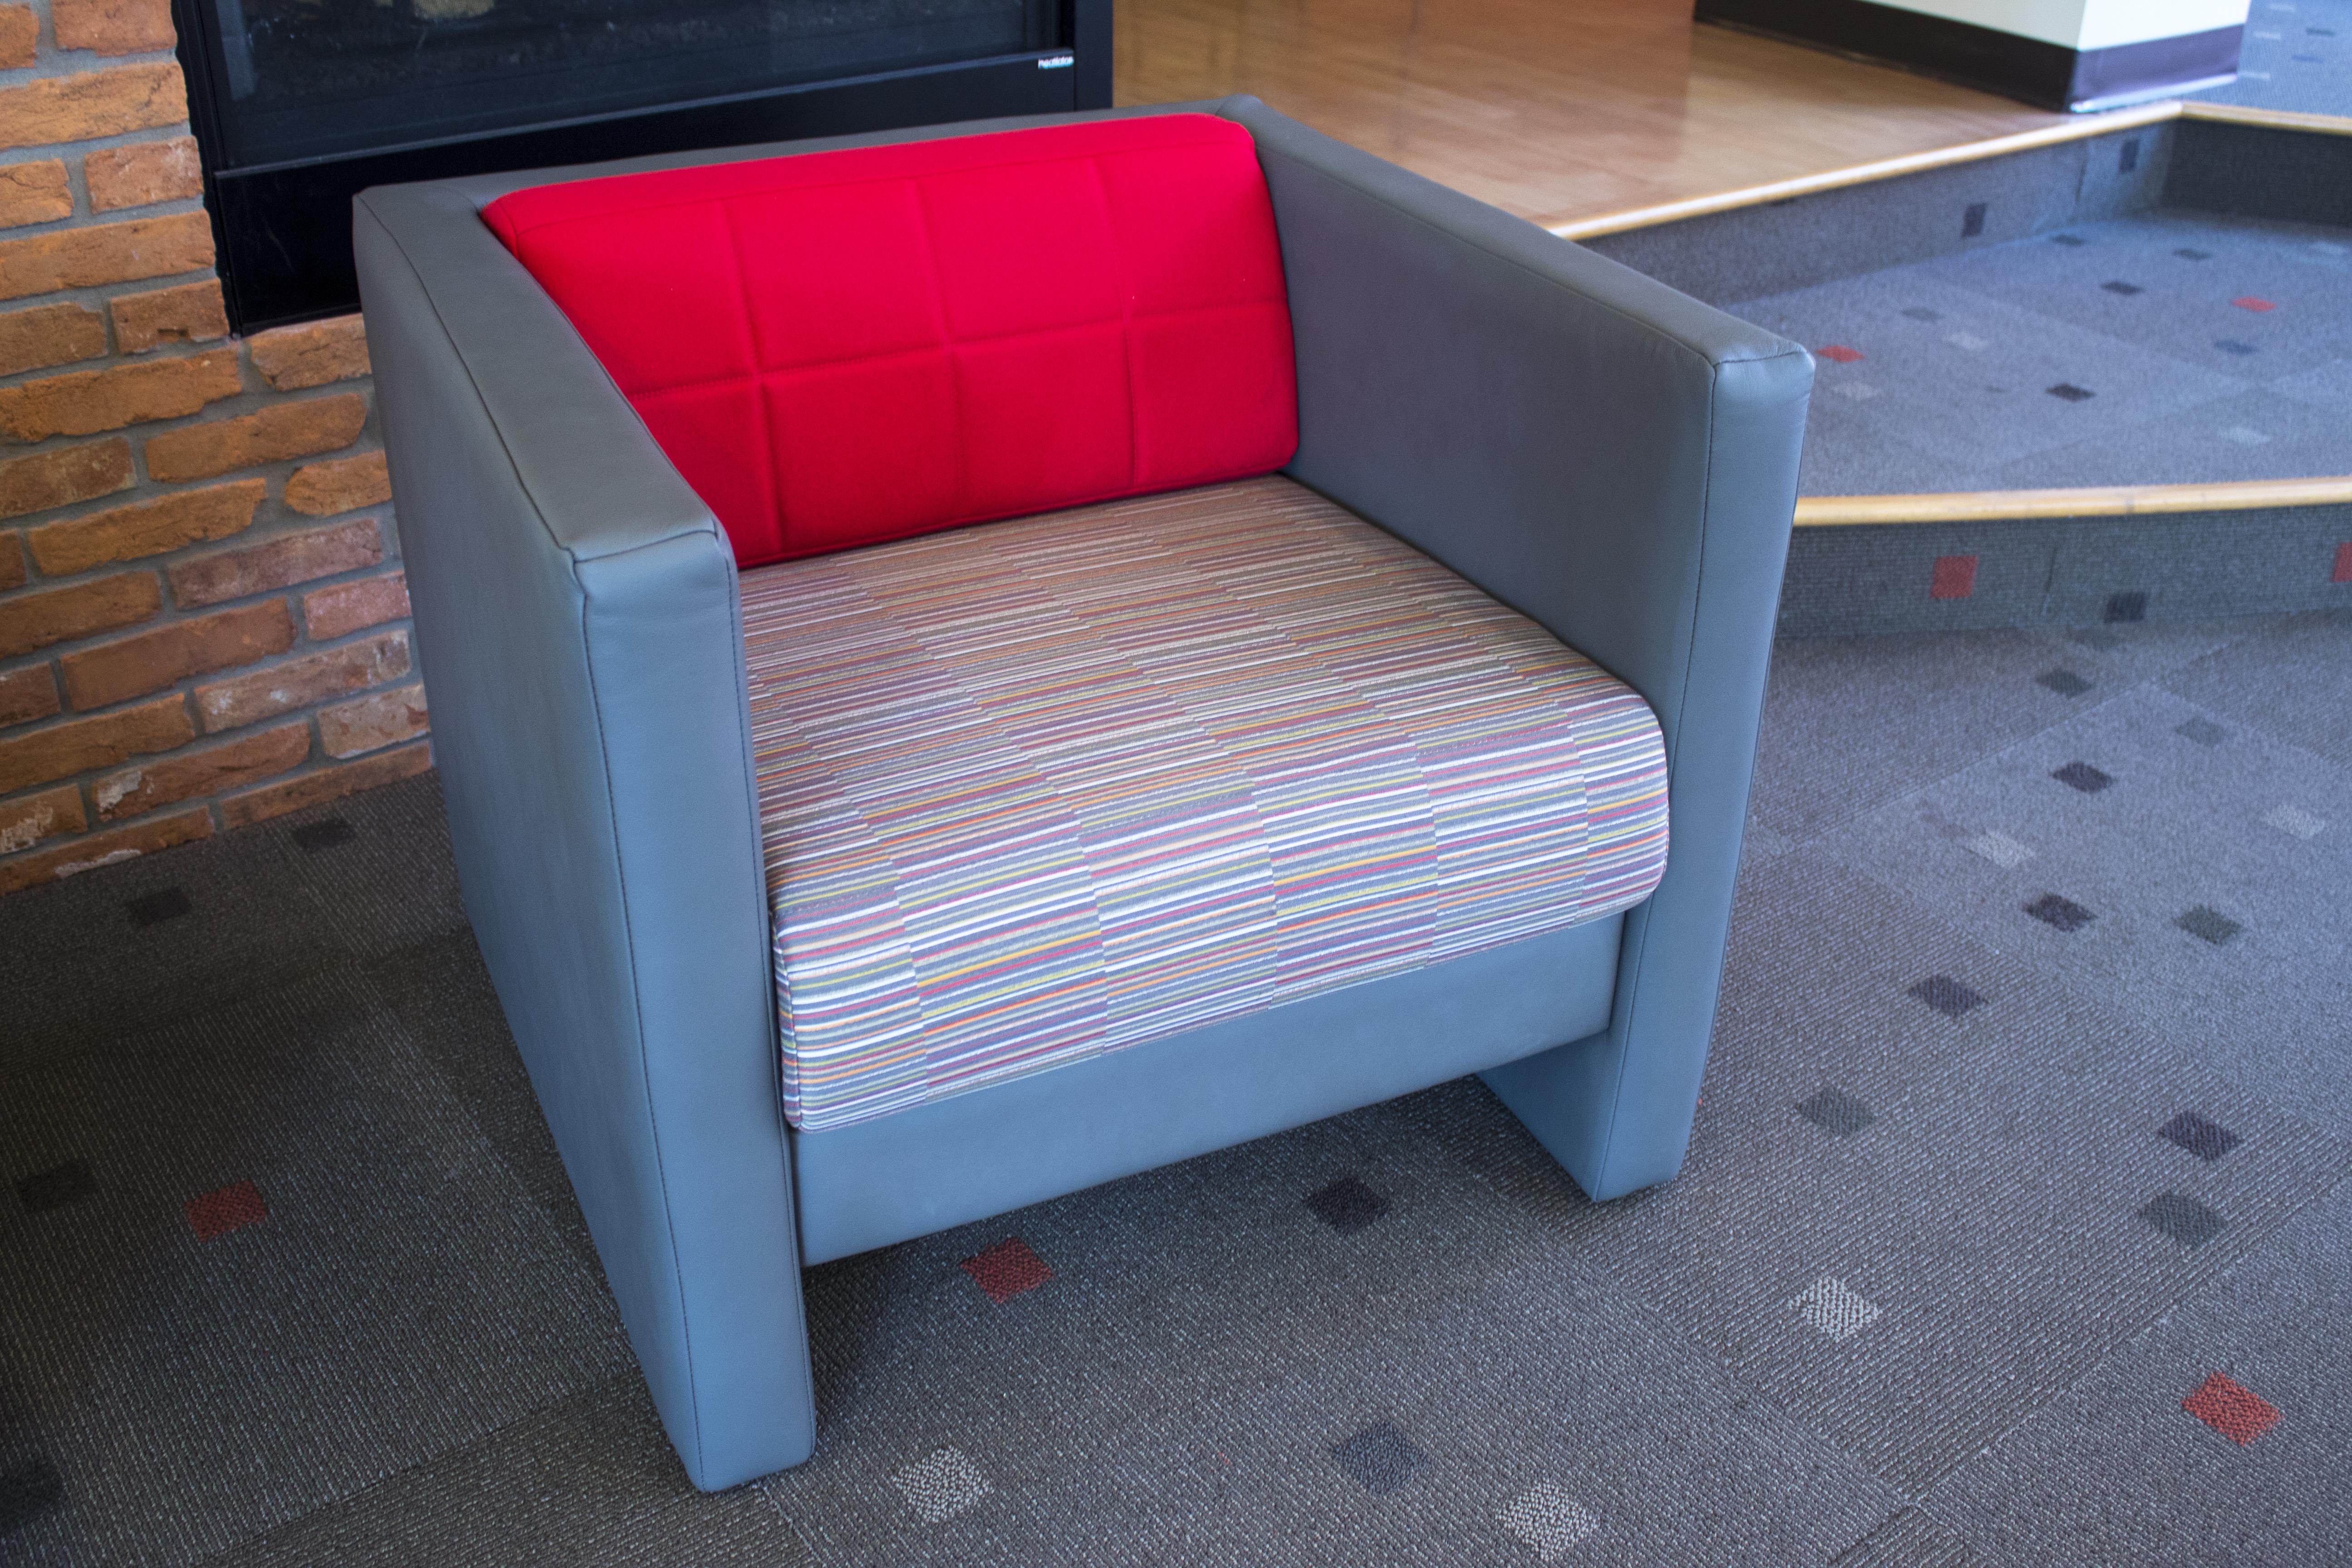 National Tellaro with Art of Board Seat Fabric